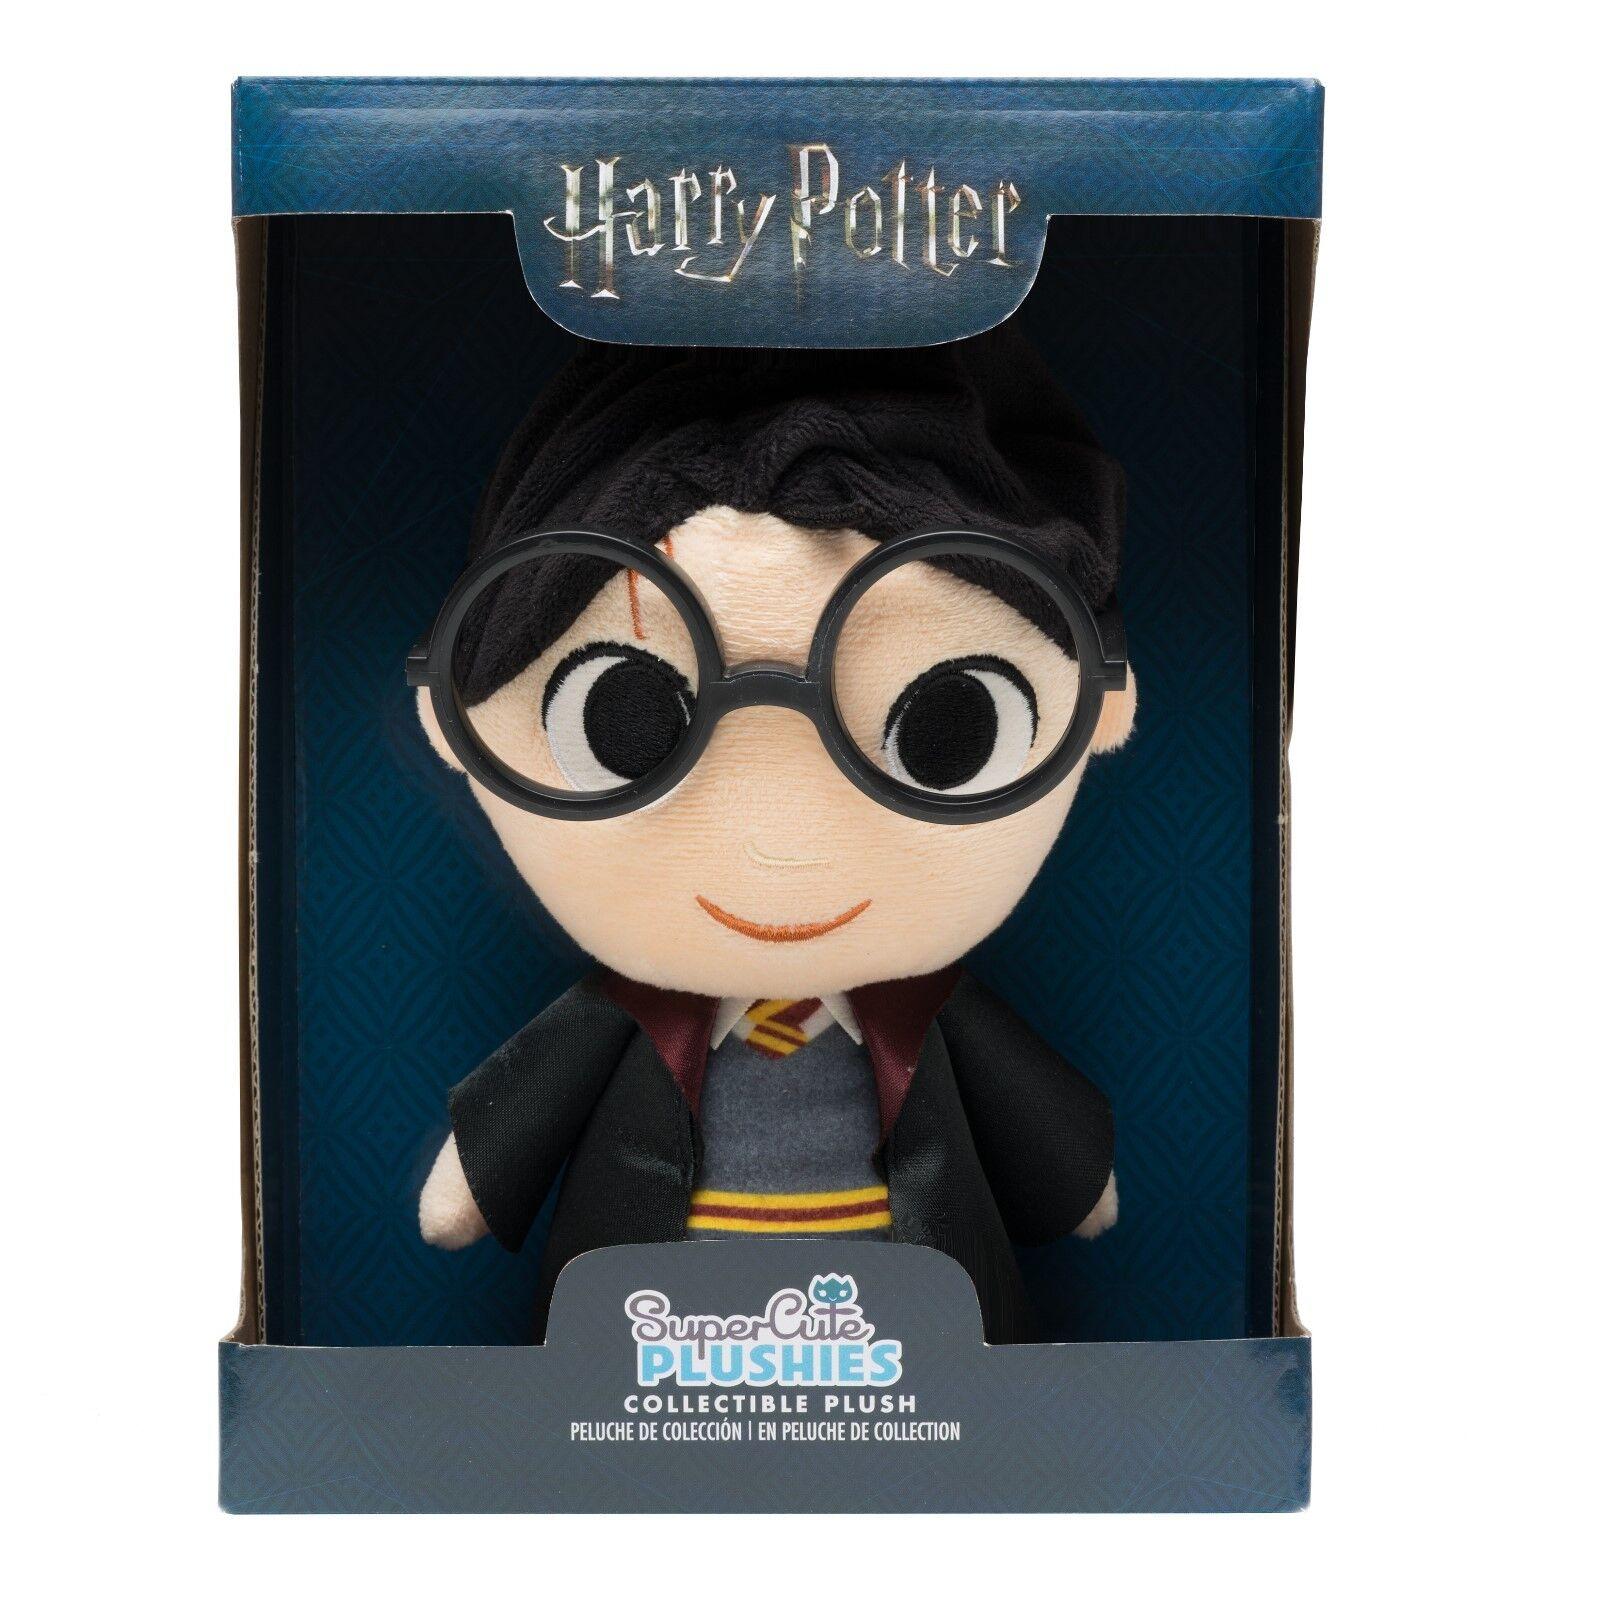 FUNKO HARRY POTTER Super Super Super Cute Plushies - HARRY POTTER Plush 2018 NEW 706bd4